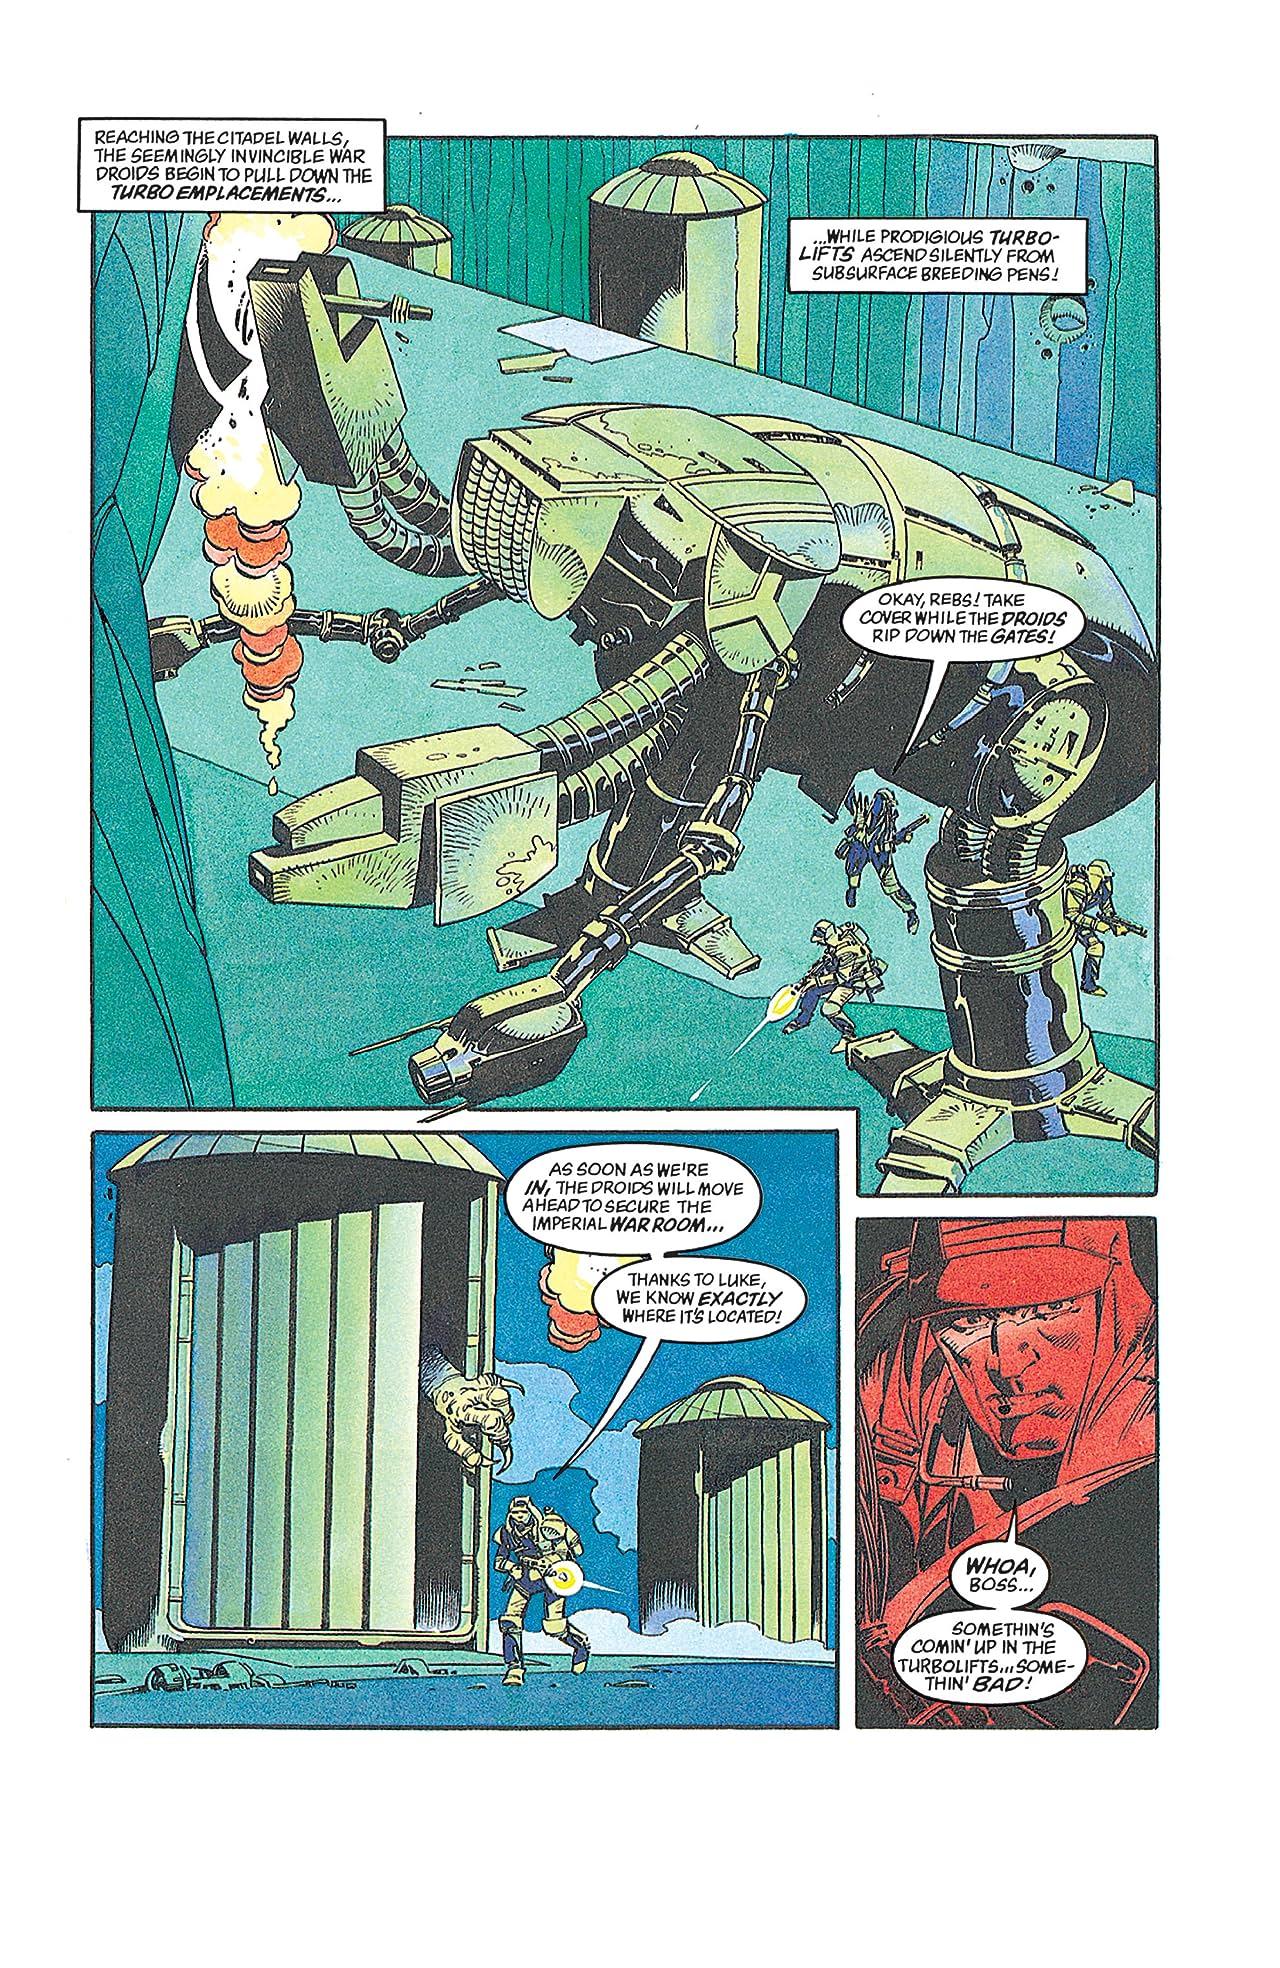 Star Wars: Dark Empire II (1994-1995) #5 (of 6)